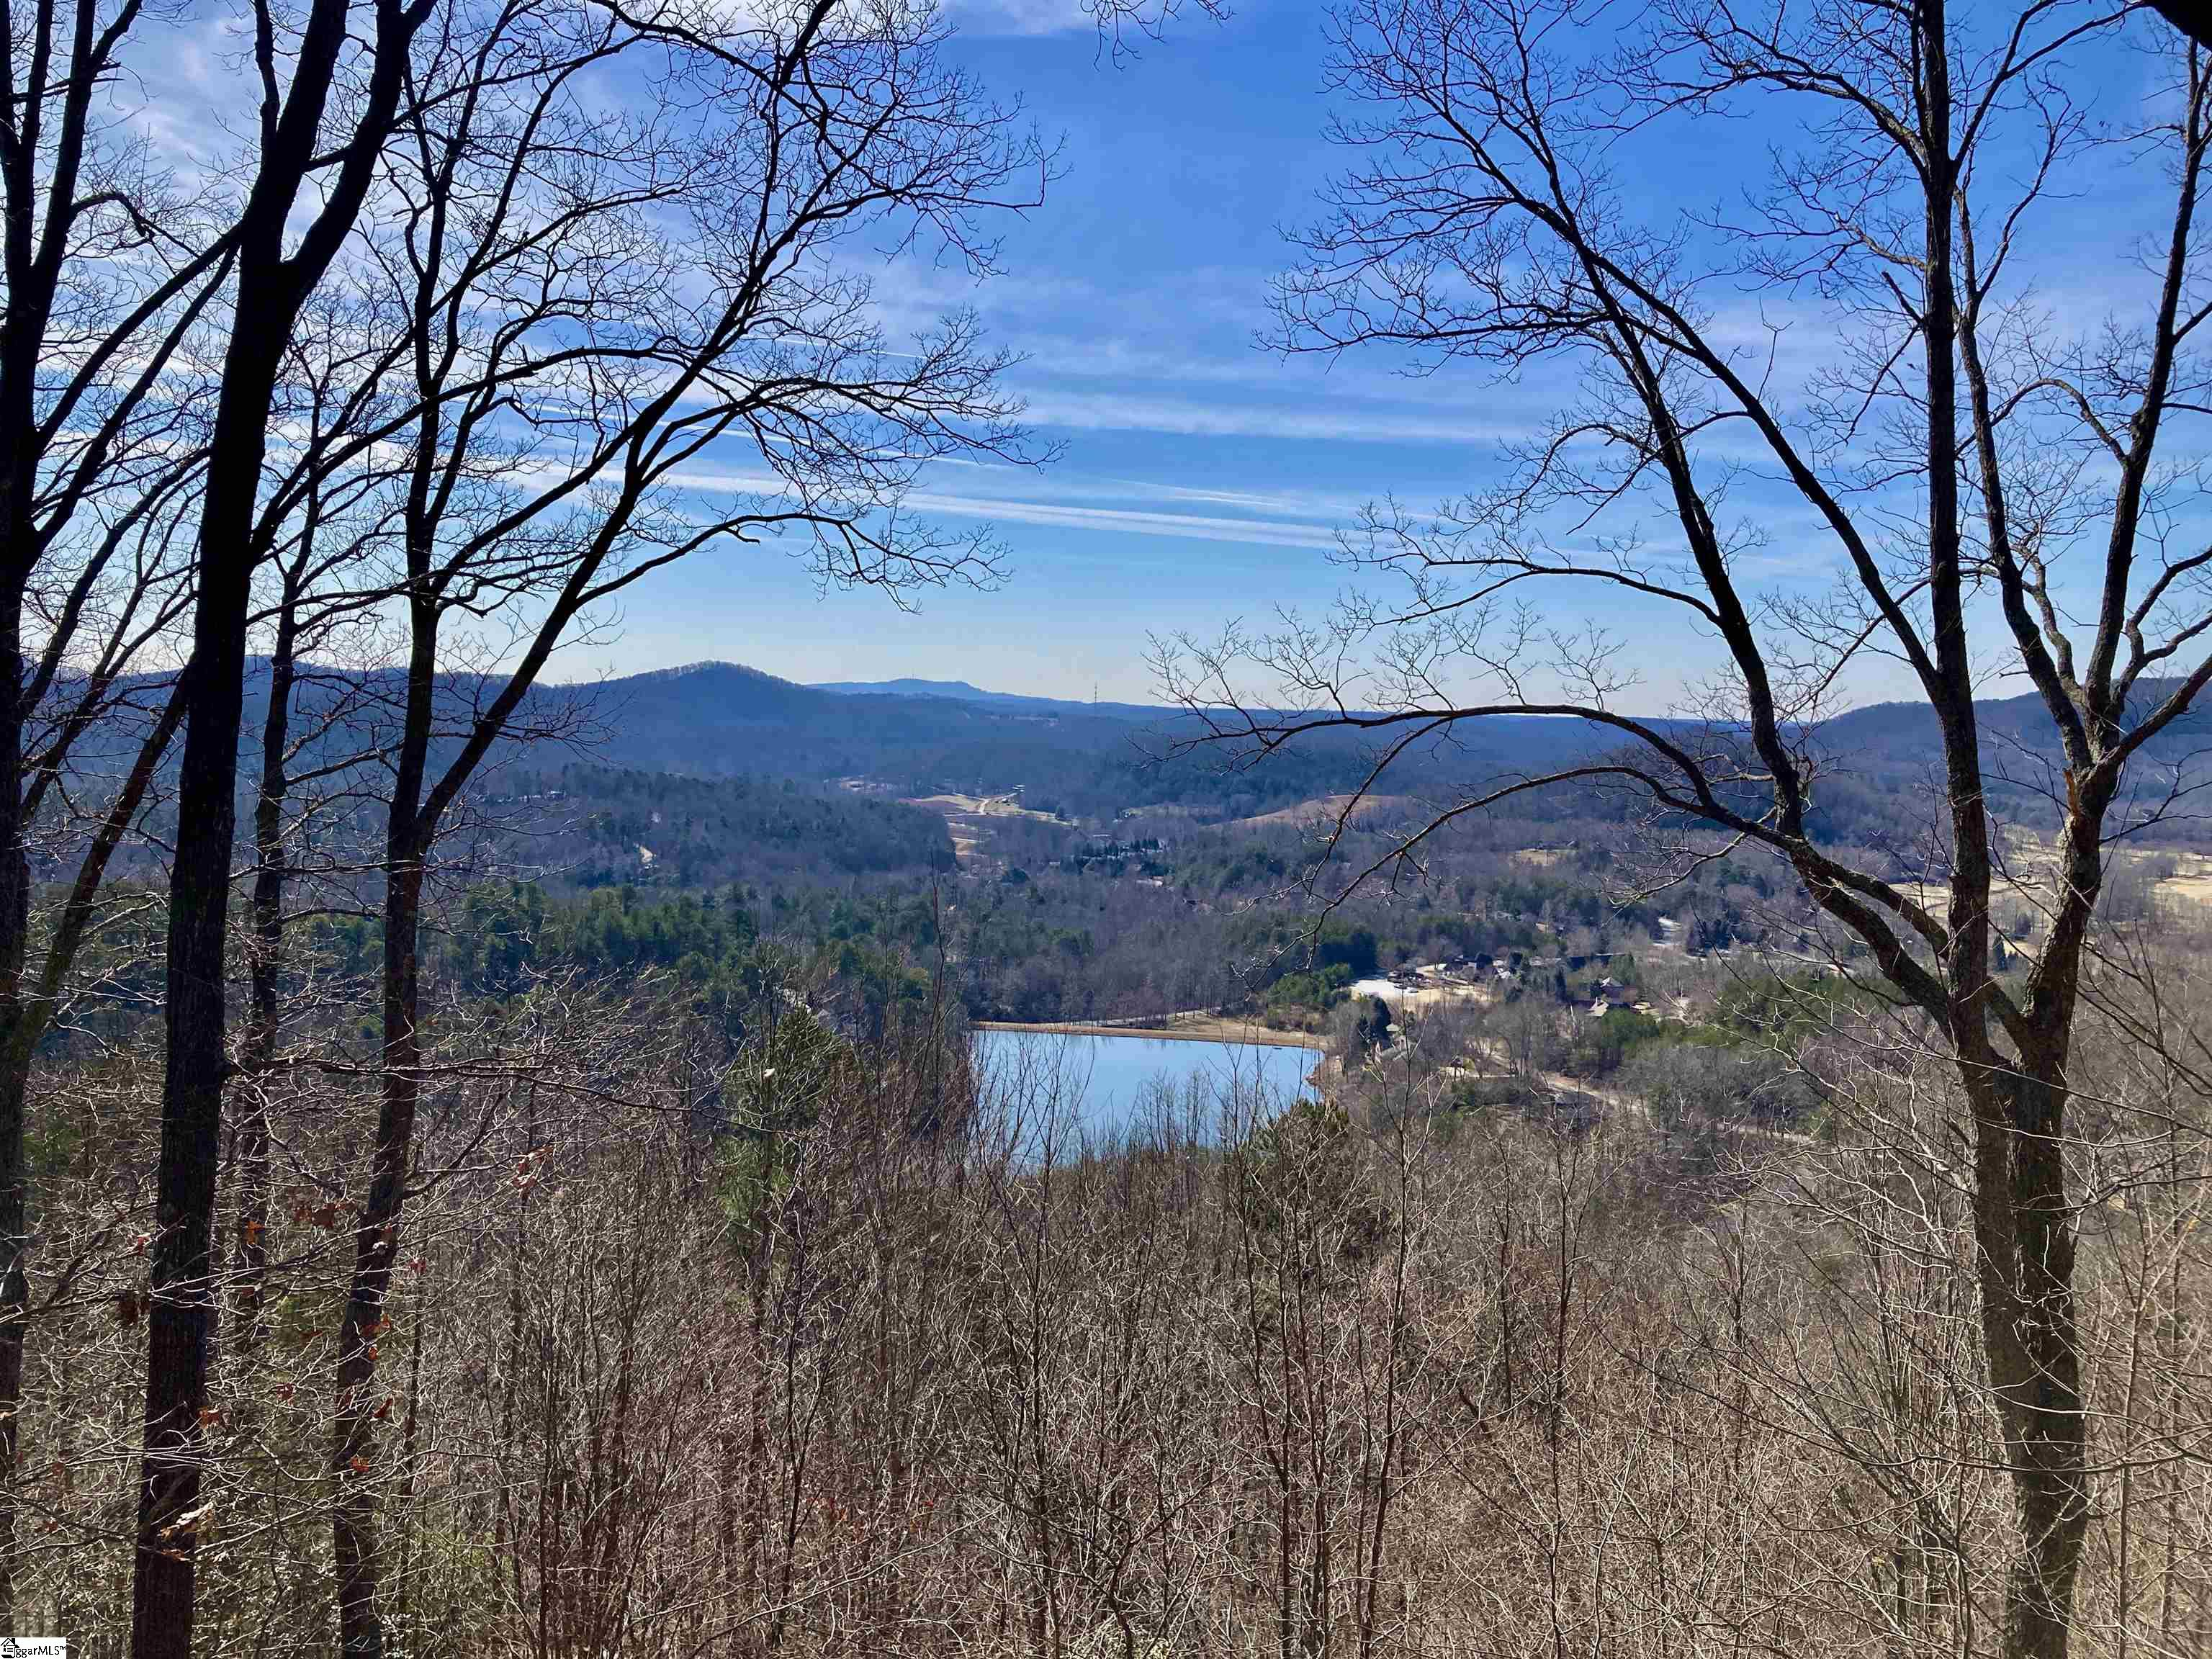 345 Mountain Summit Road, Travelers Rest SC 29690 - Photo 2